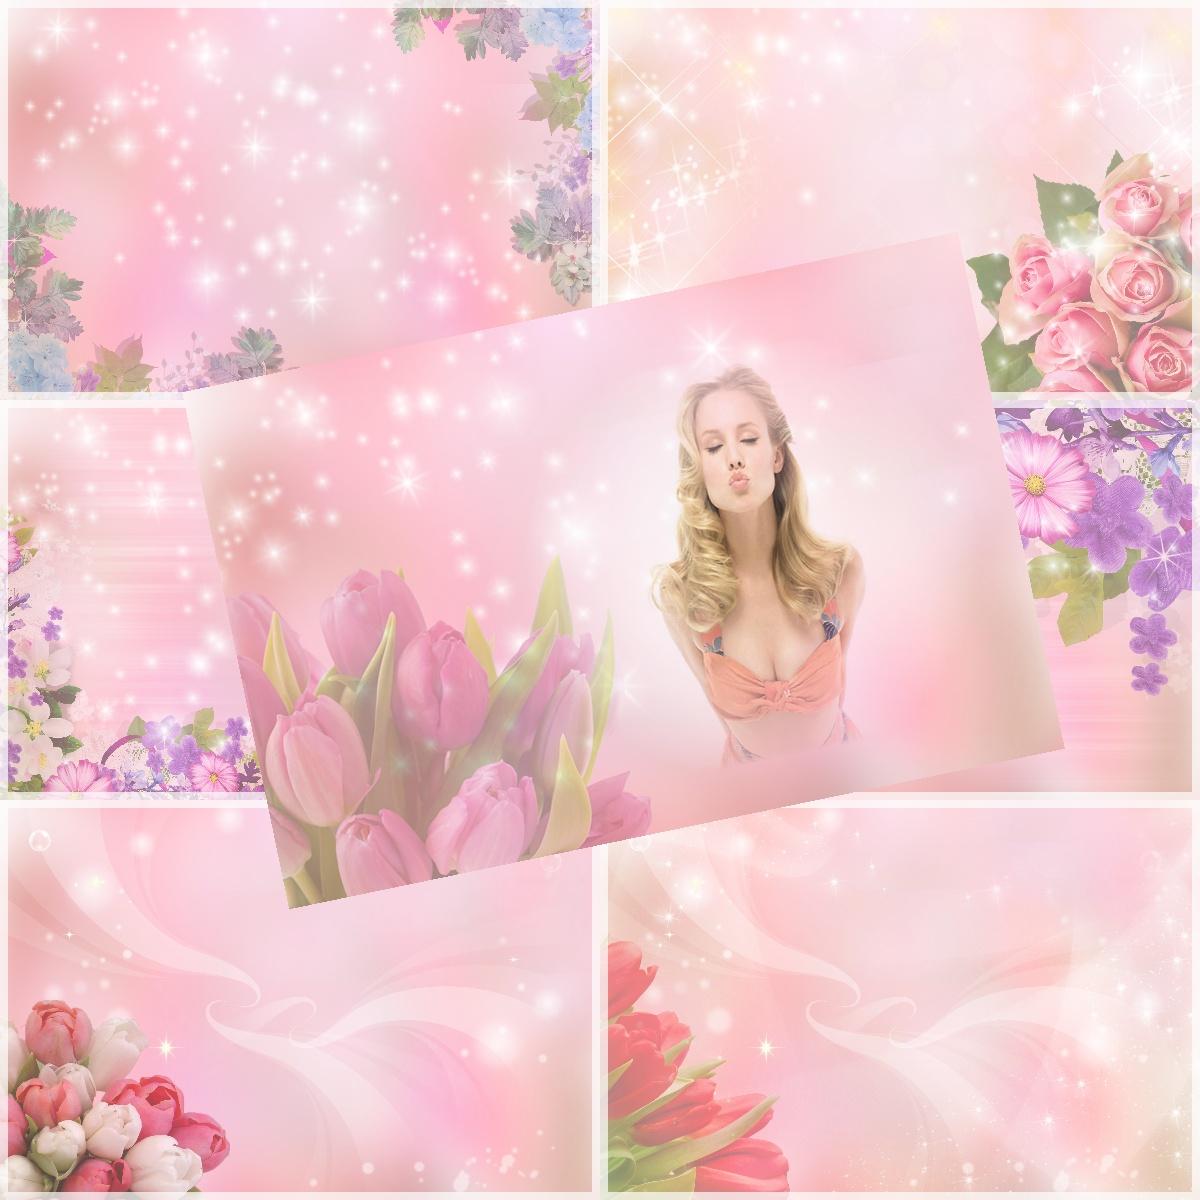 Fondos Florales Tonos Rosas Hd Fotomontajes Accionglobalxsoft